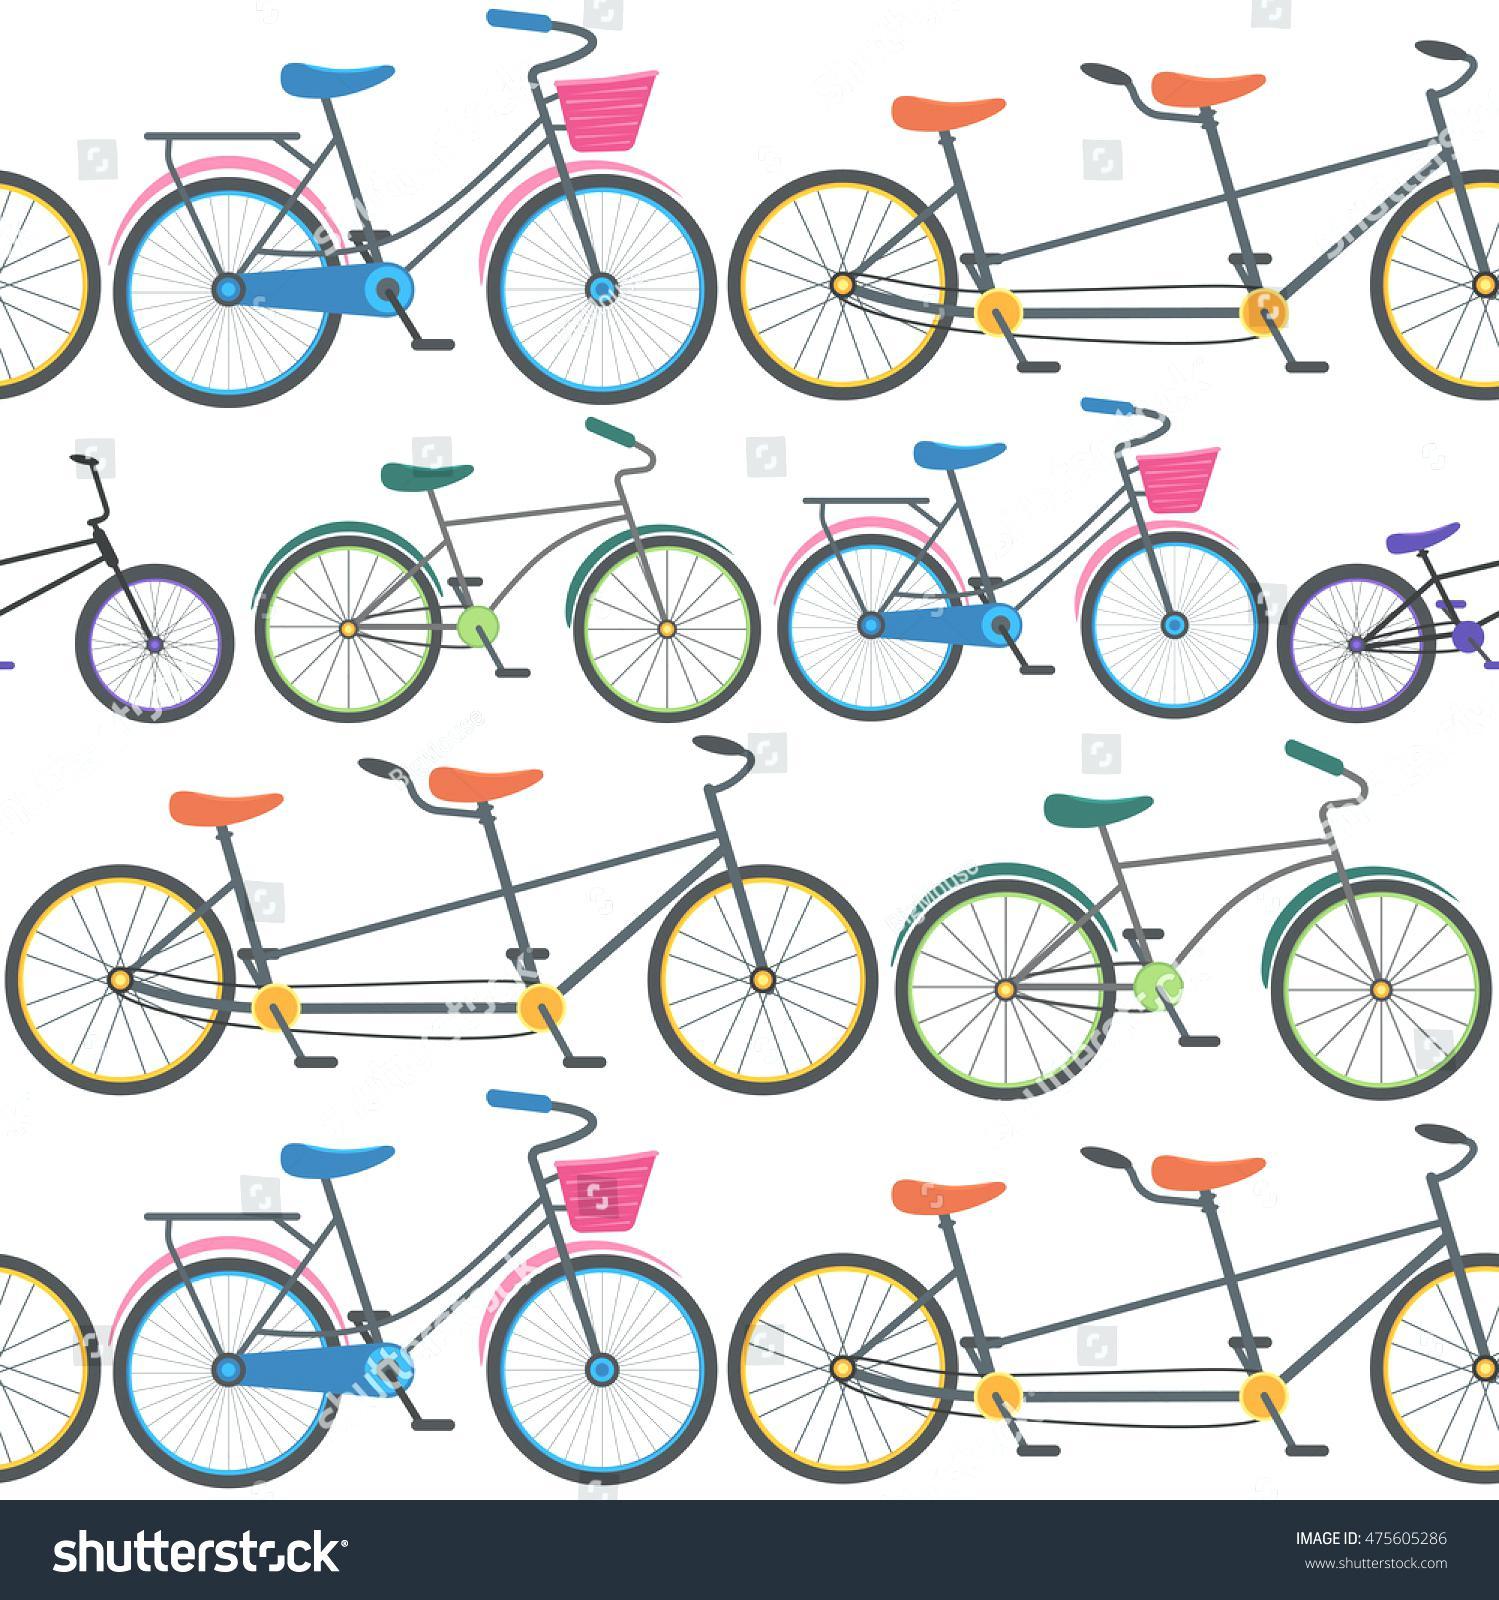 1499x1600 Tandem Bike 4 Sf Bicycle Bikes Excellent Sport Univega Aluminum